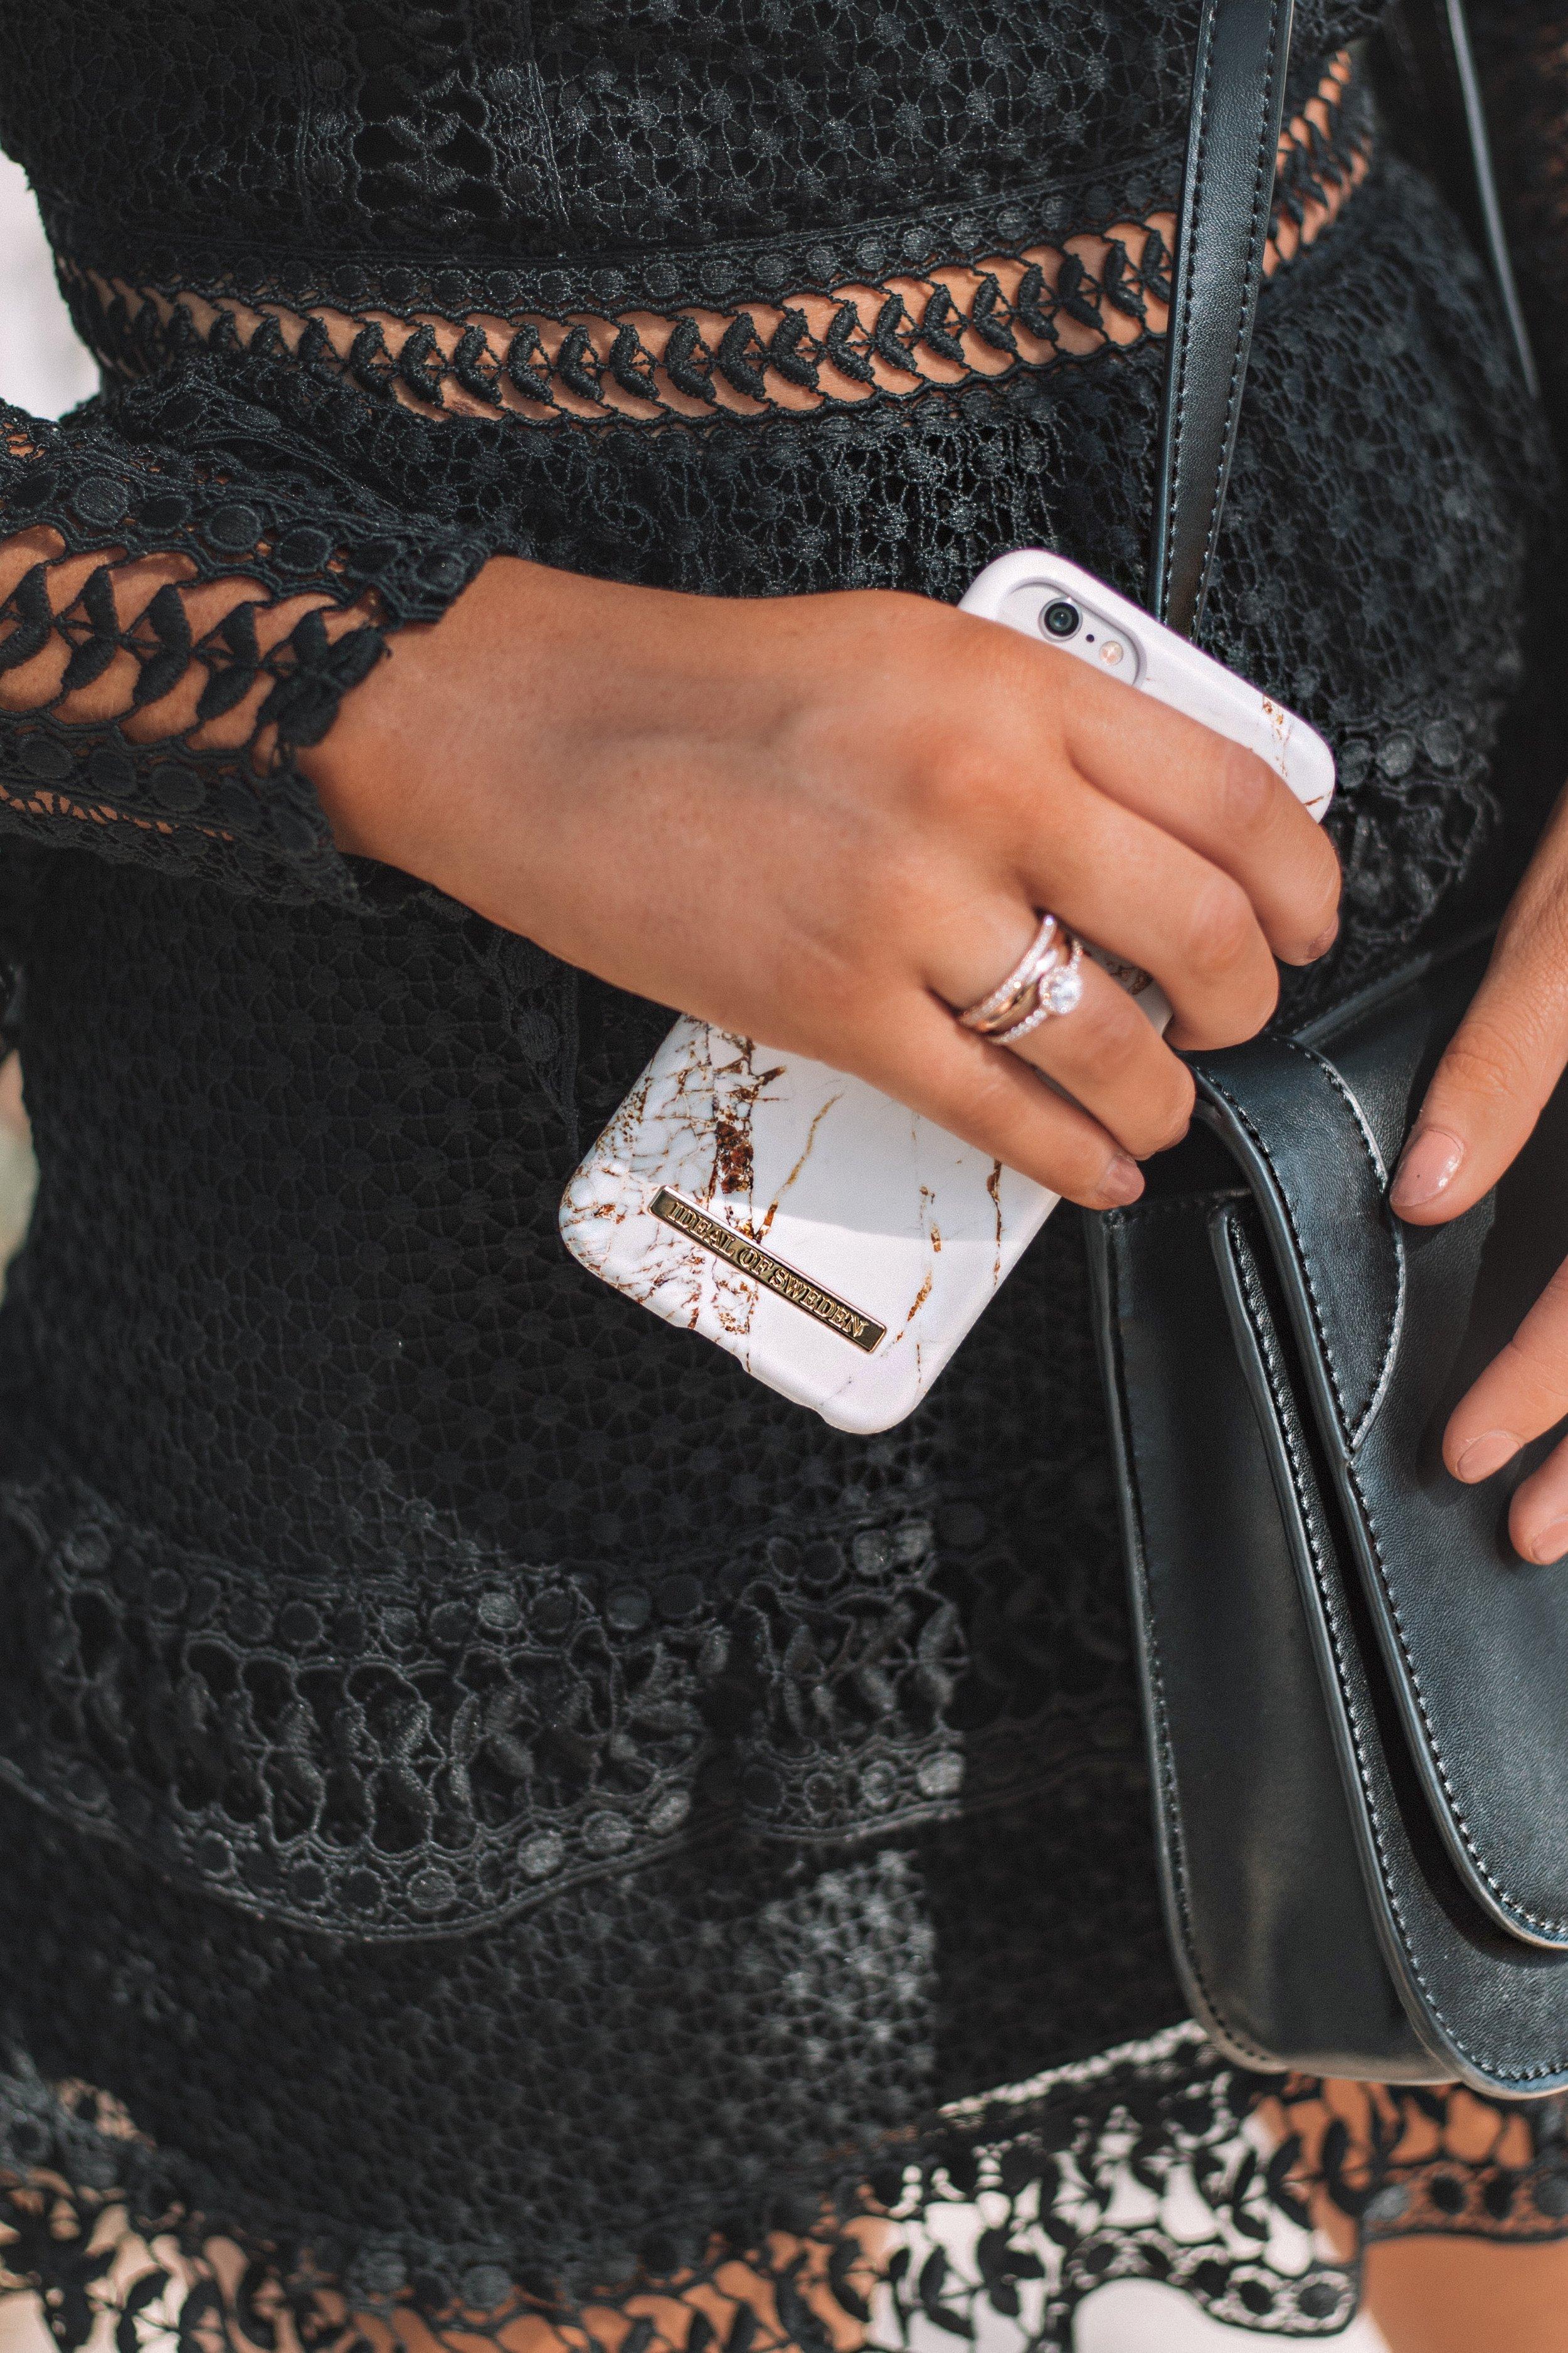 iDeal Sweden Marble Phone Case - Izzy Wears Blog